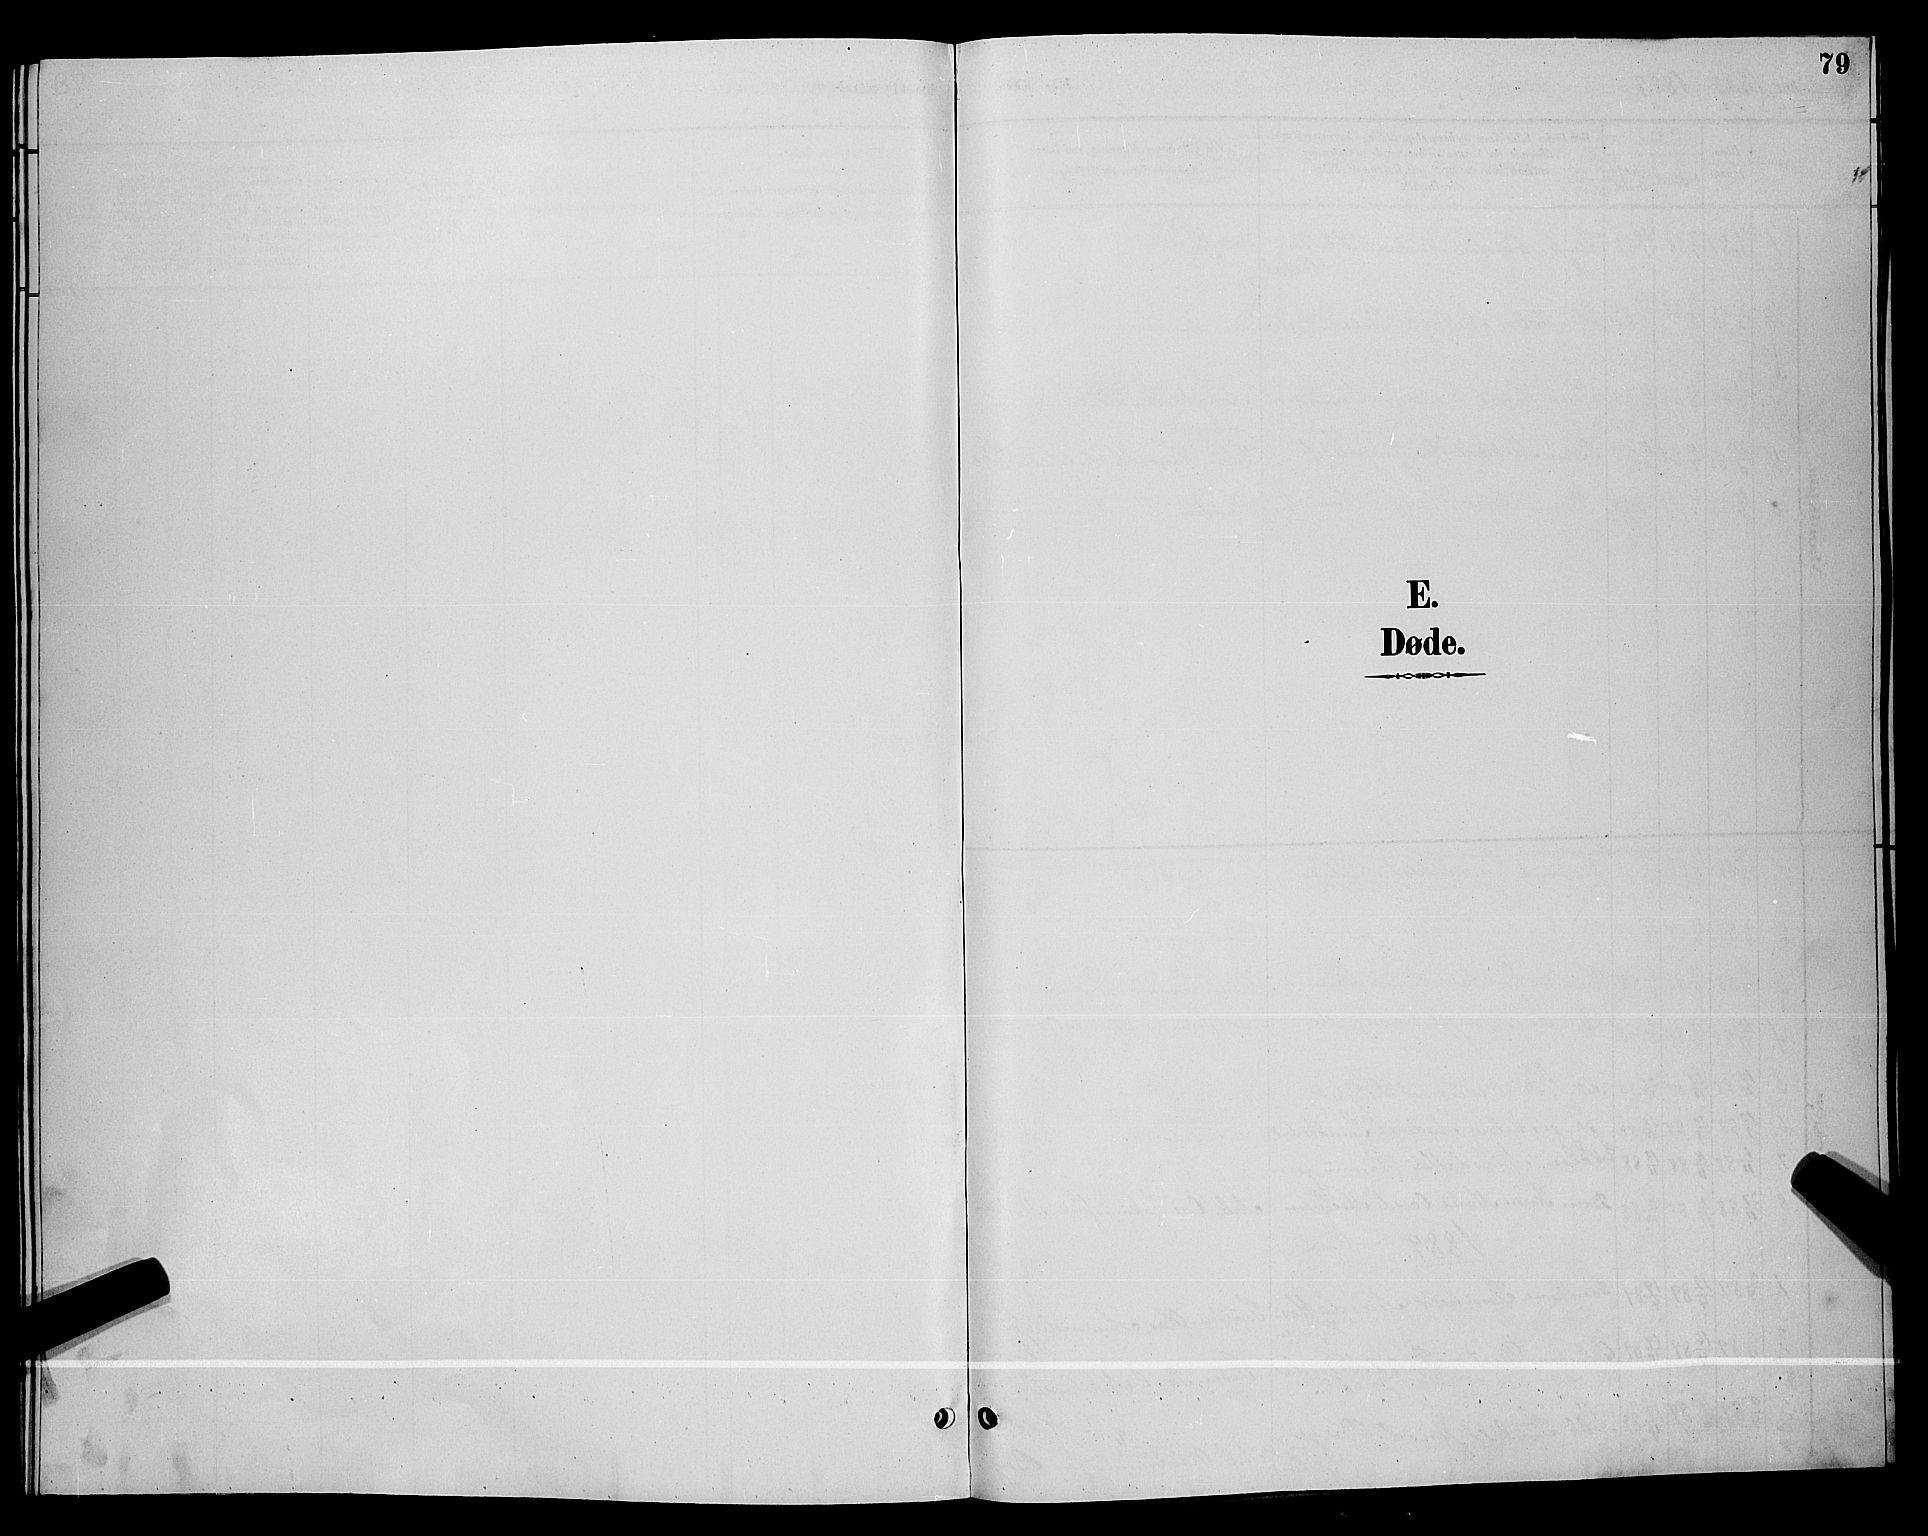 SAKO, Lunde kirkebøker, G/Gb/L0002: Klokkerbok nr. II 2, 1888-1895, s. 79